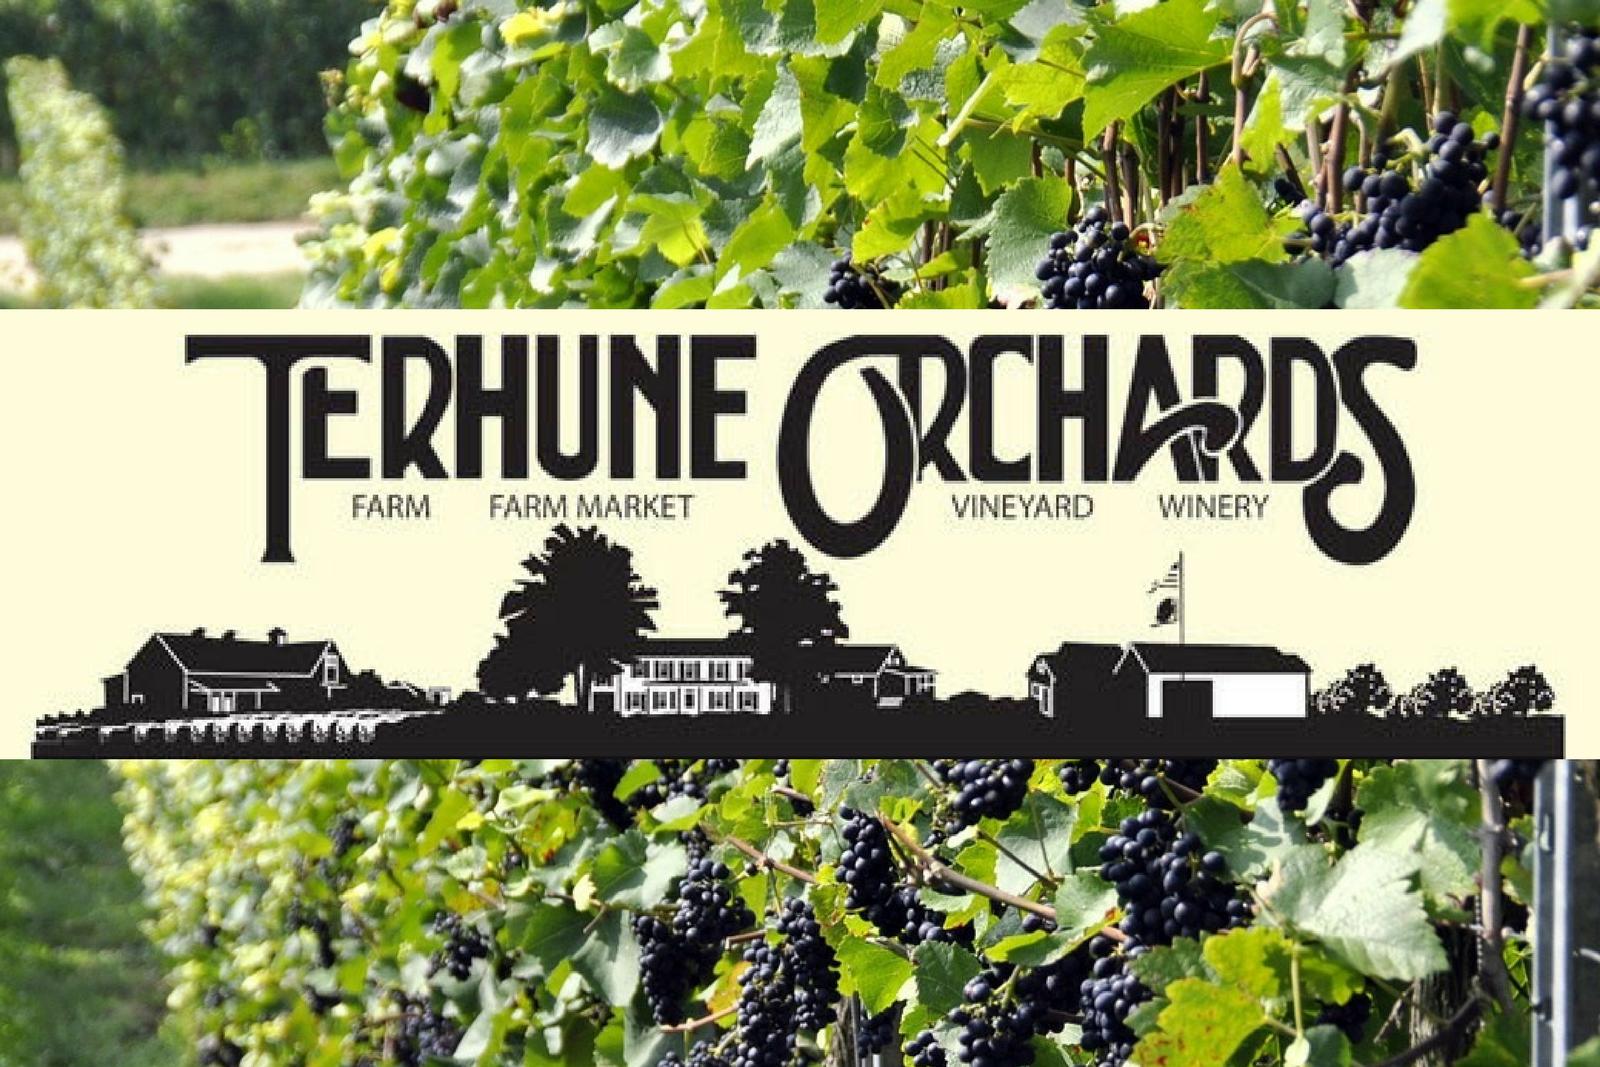 logo of winery